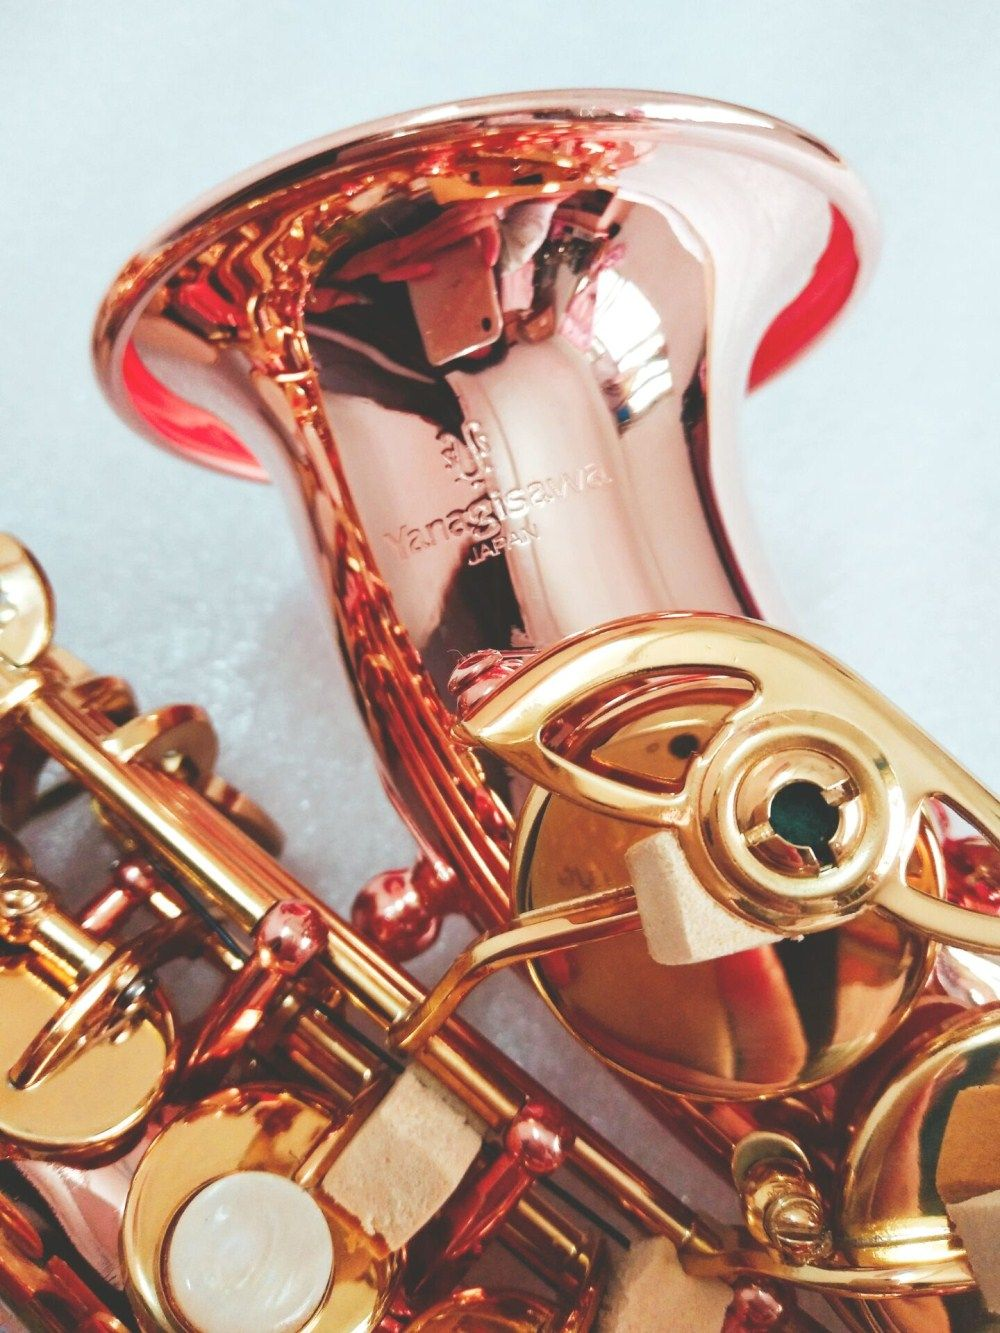 New Yanagisawa Soprano Saxophone Bb Phosphorus Bronze copper Sax SC-992 Yanagisawa Musical Instrument Promotions Free shipping